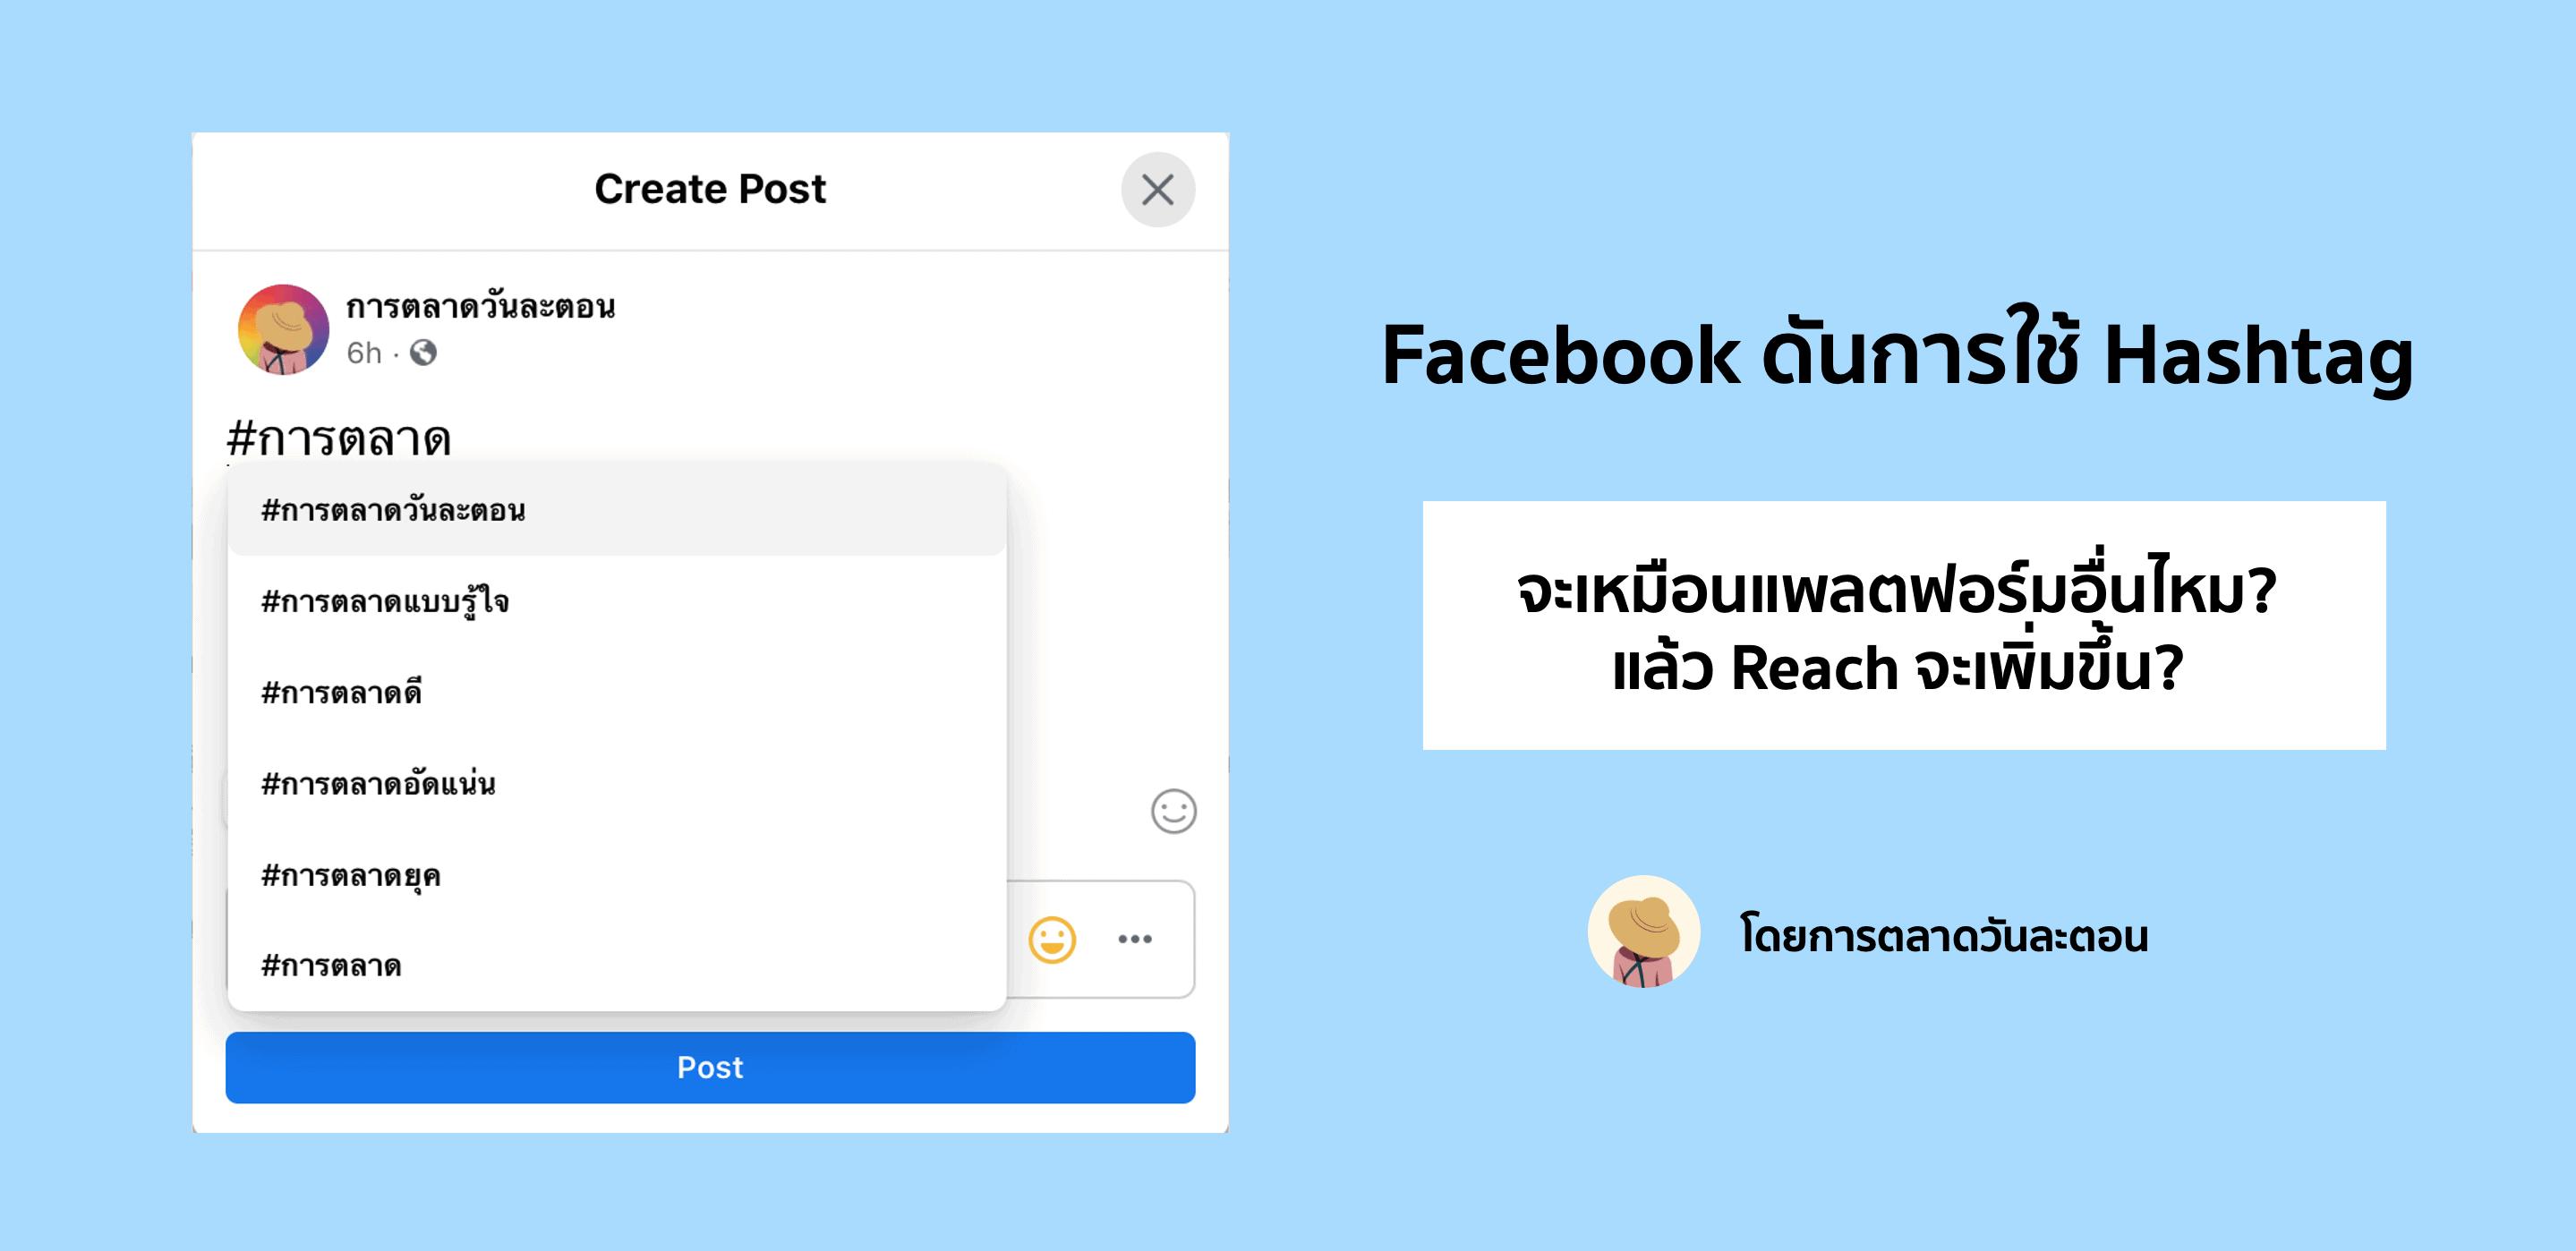 Facebook Hashtags – ทำให้ยอด Reach ดีขึ้นจริงไหม?